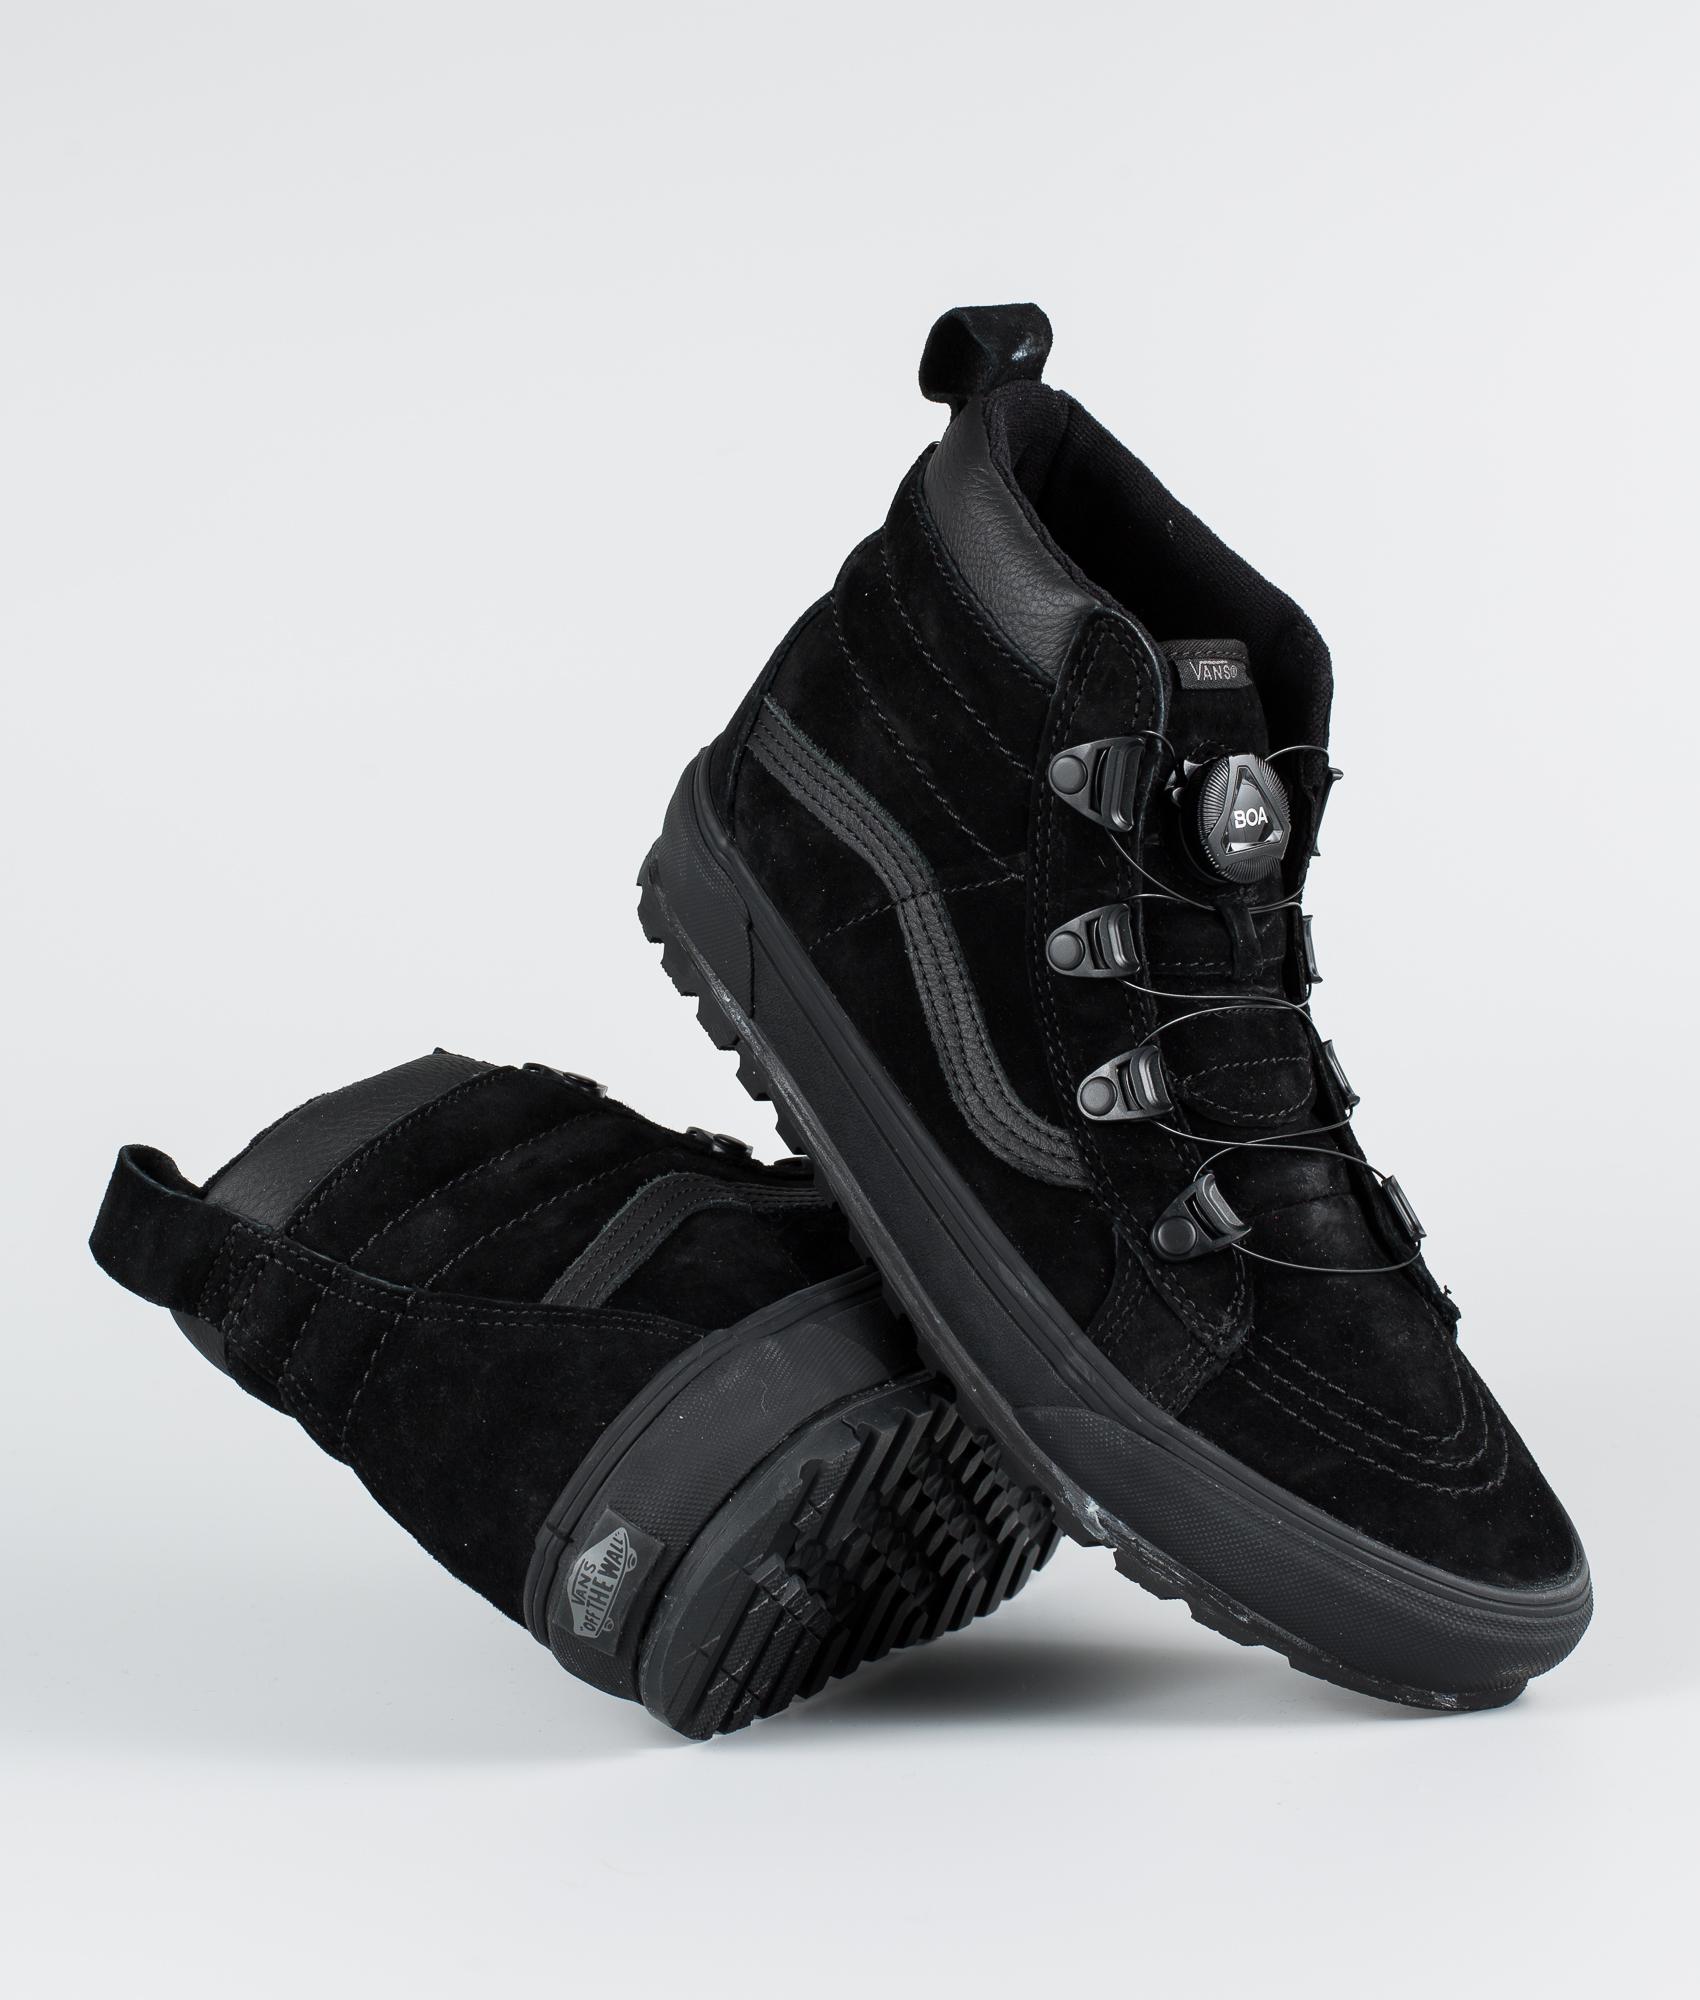 scarpe da neve vans